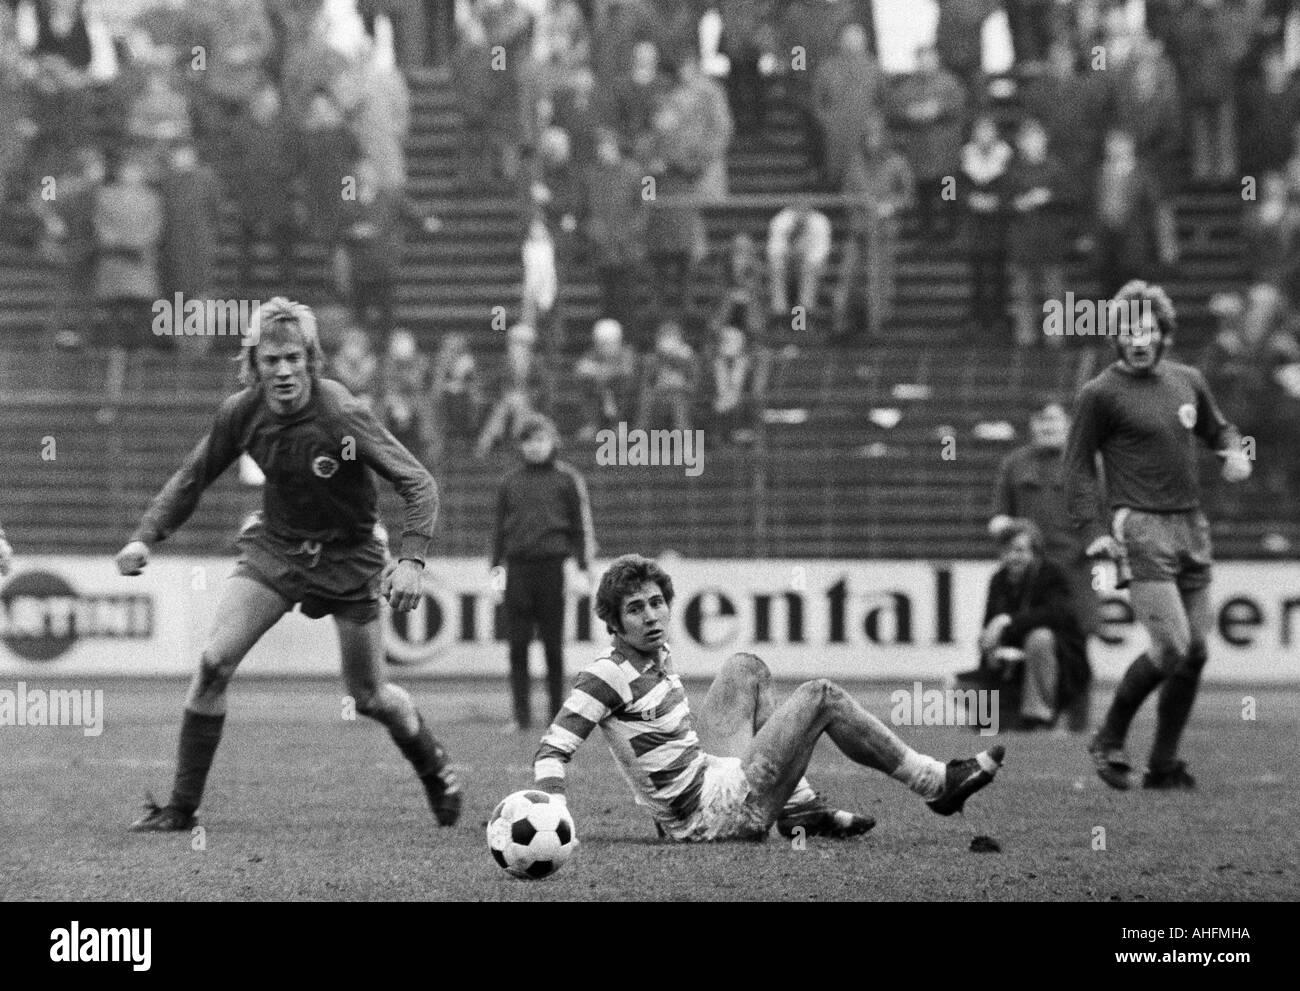 football, Bundesliga, 1971/1972, Wedau Stadium in Duisburg, MSV Duisburg versus Rot-Weiss Oberhausen 0:0, scene of the match, f.l.t.r. Jupp Tenhagen (RWO), Detlef Pirsig (MSV), Willi Mumme (RWO) - Stock Image